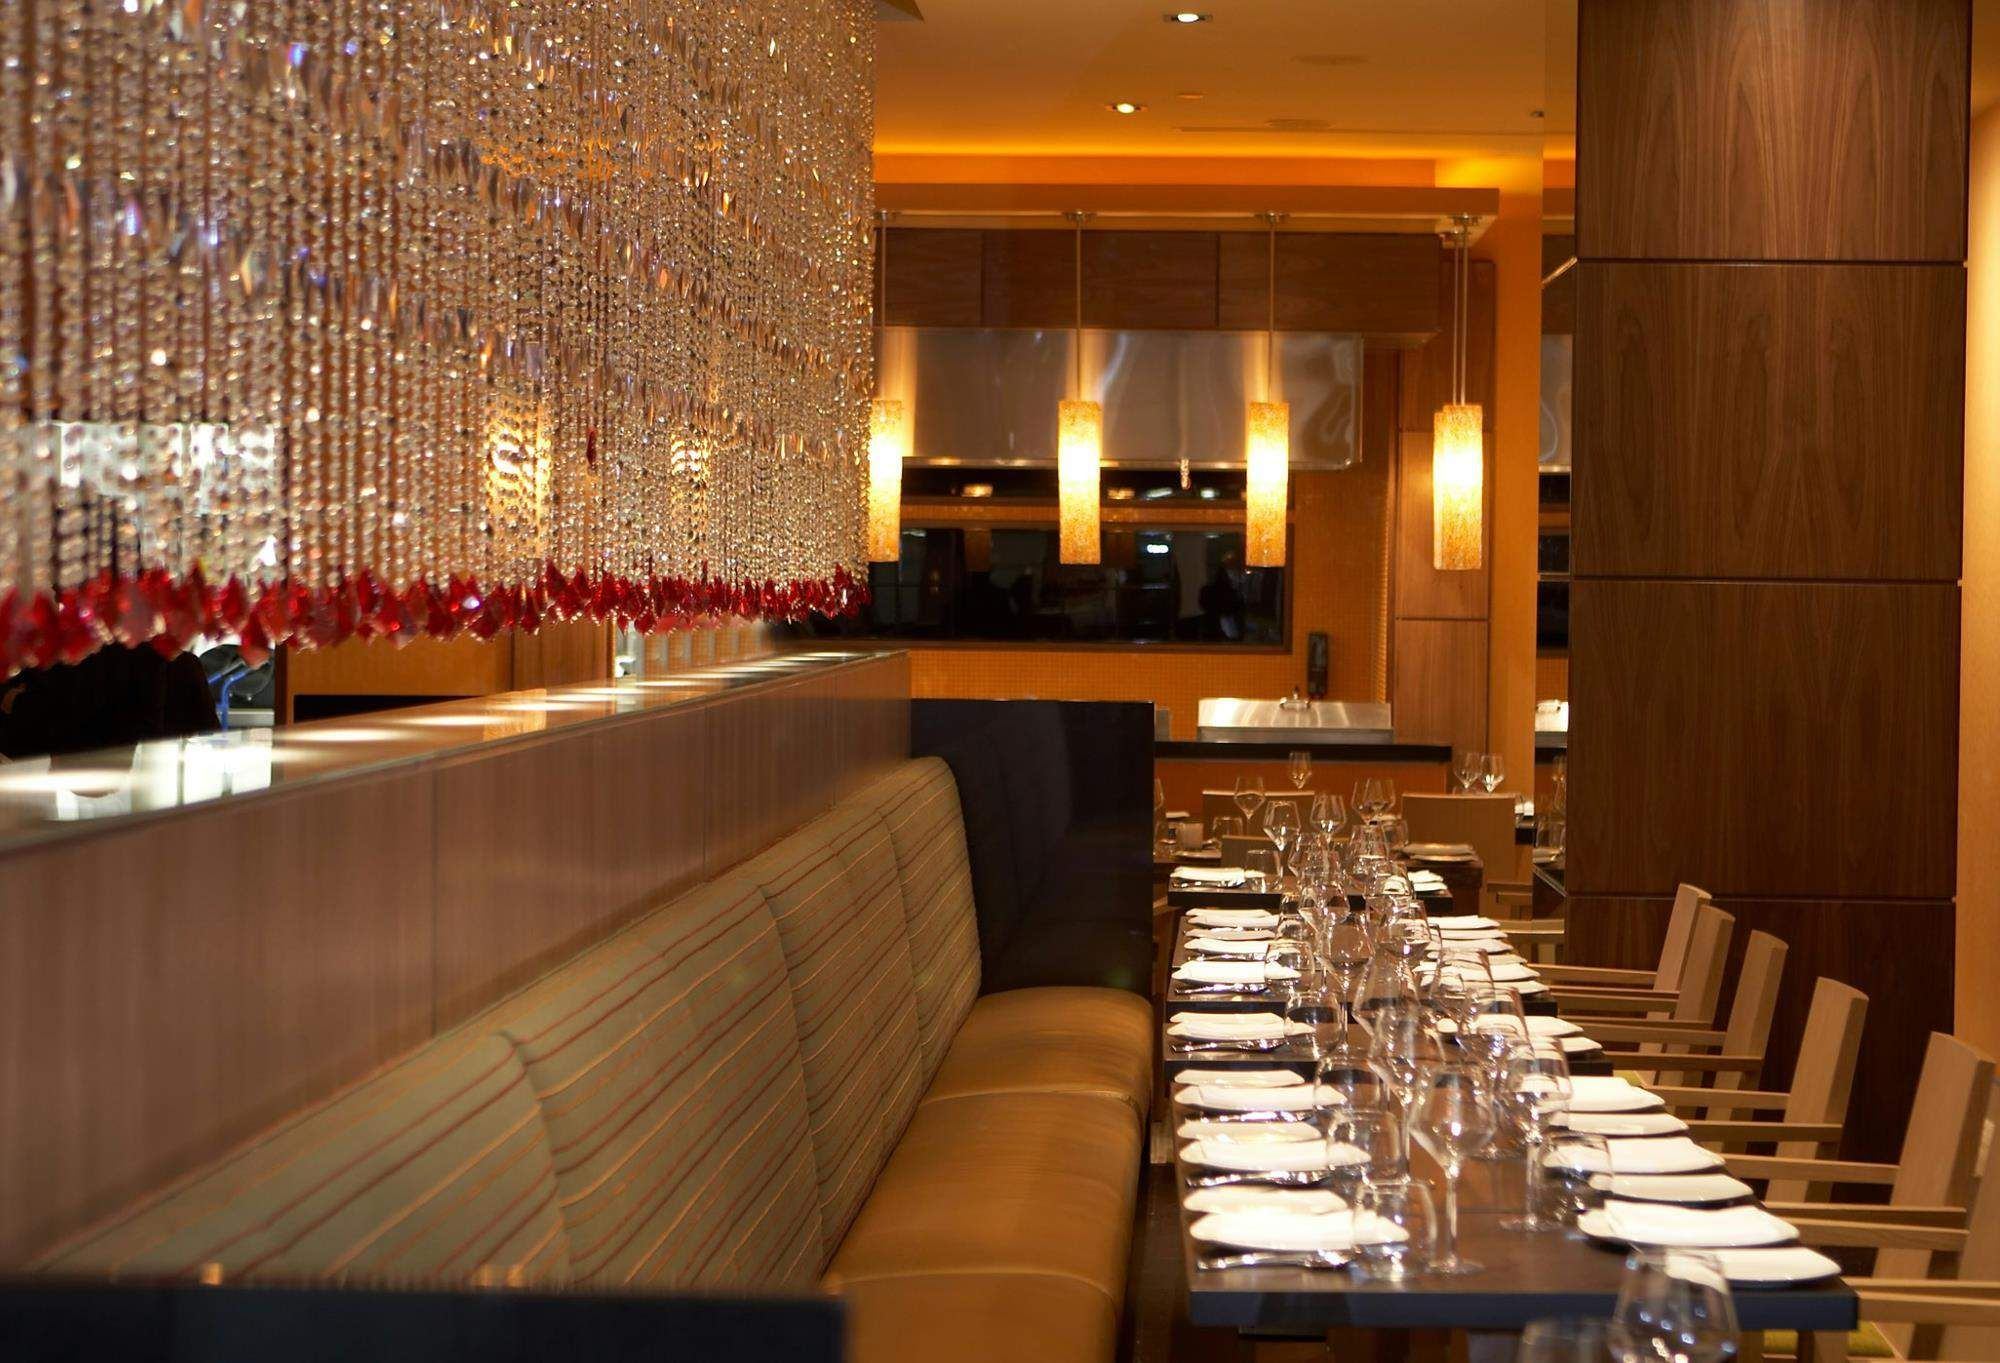 Indian restaurants interior design the best indian restaurants in america  washington dc and restaurants